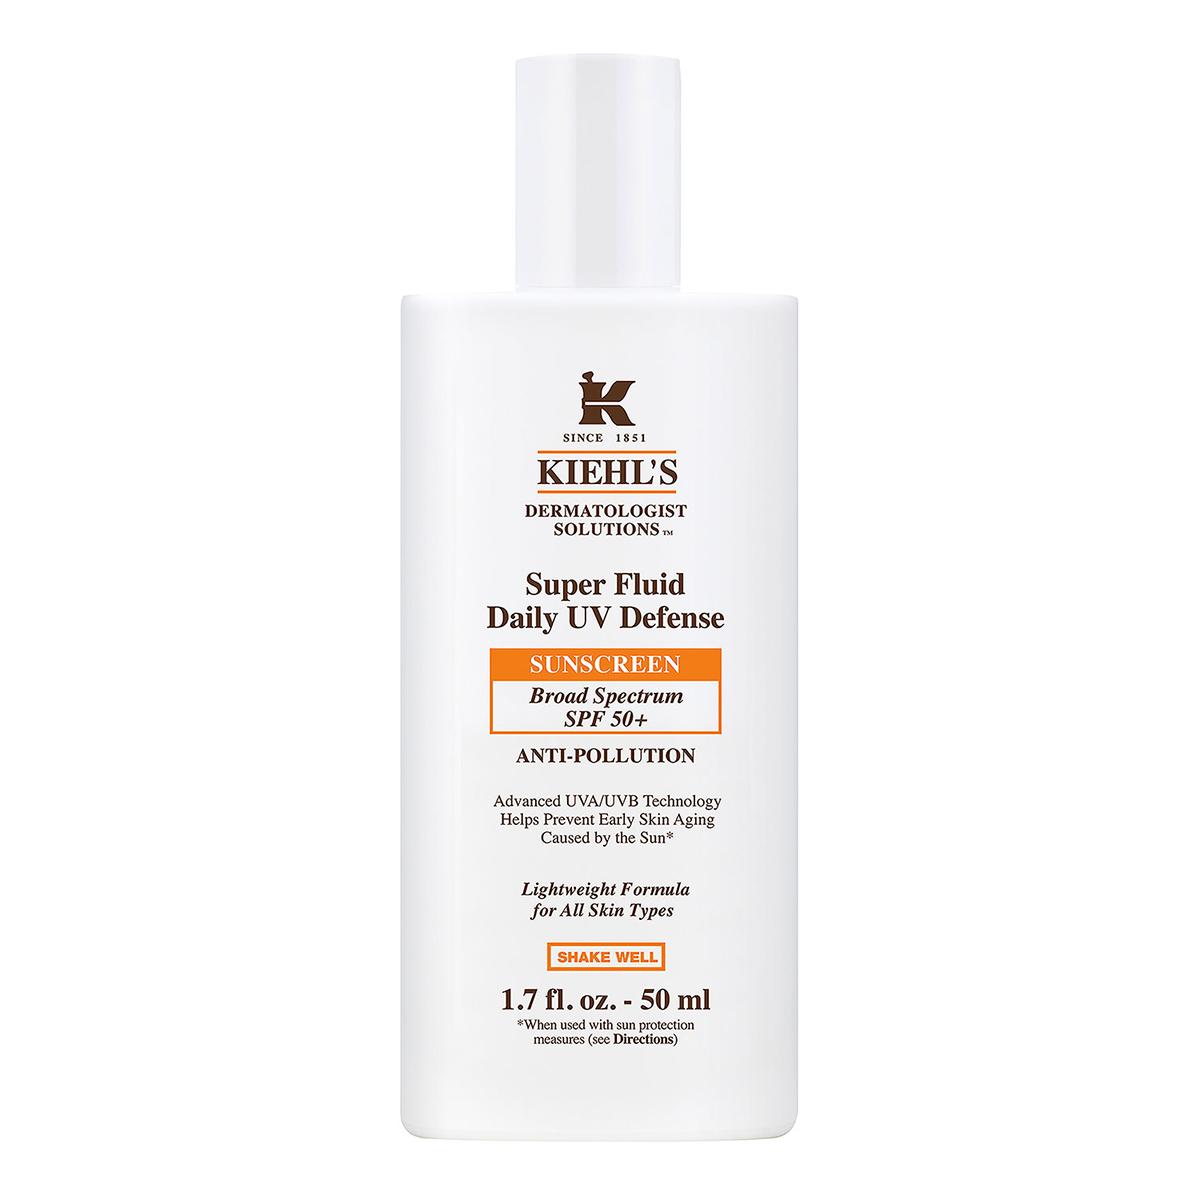 Kiehl's Sunscreen Product